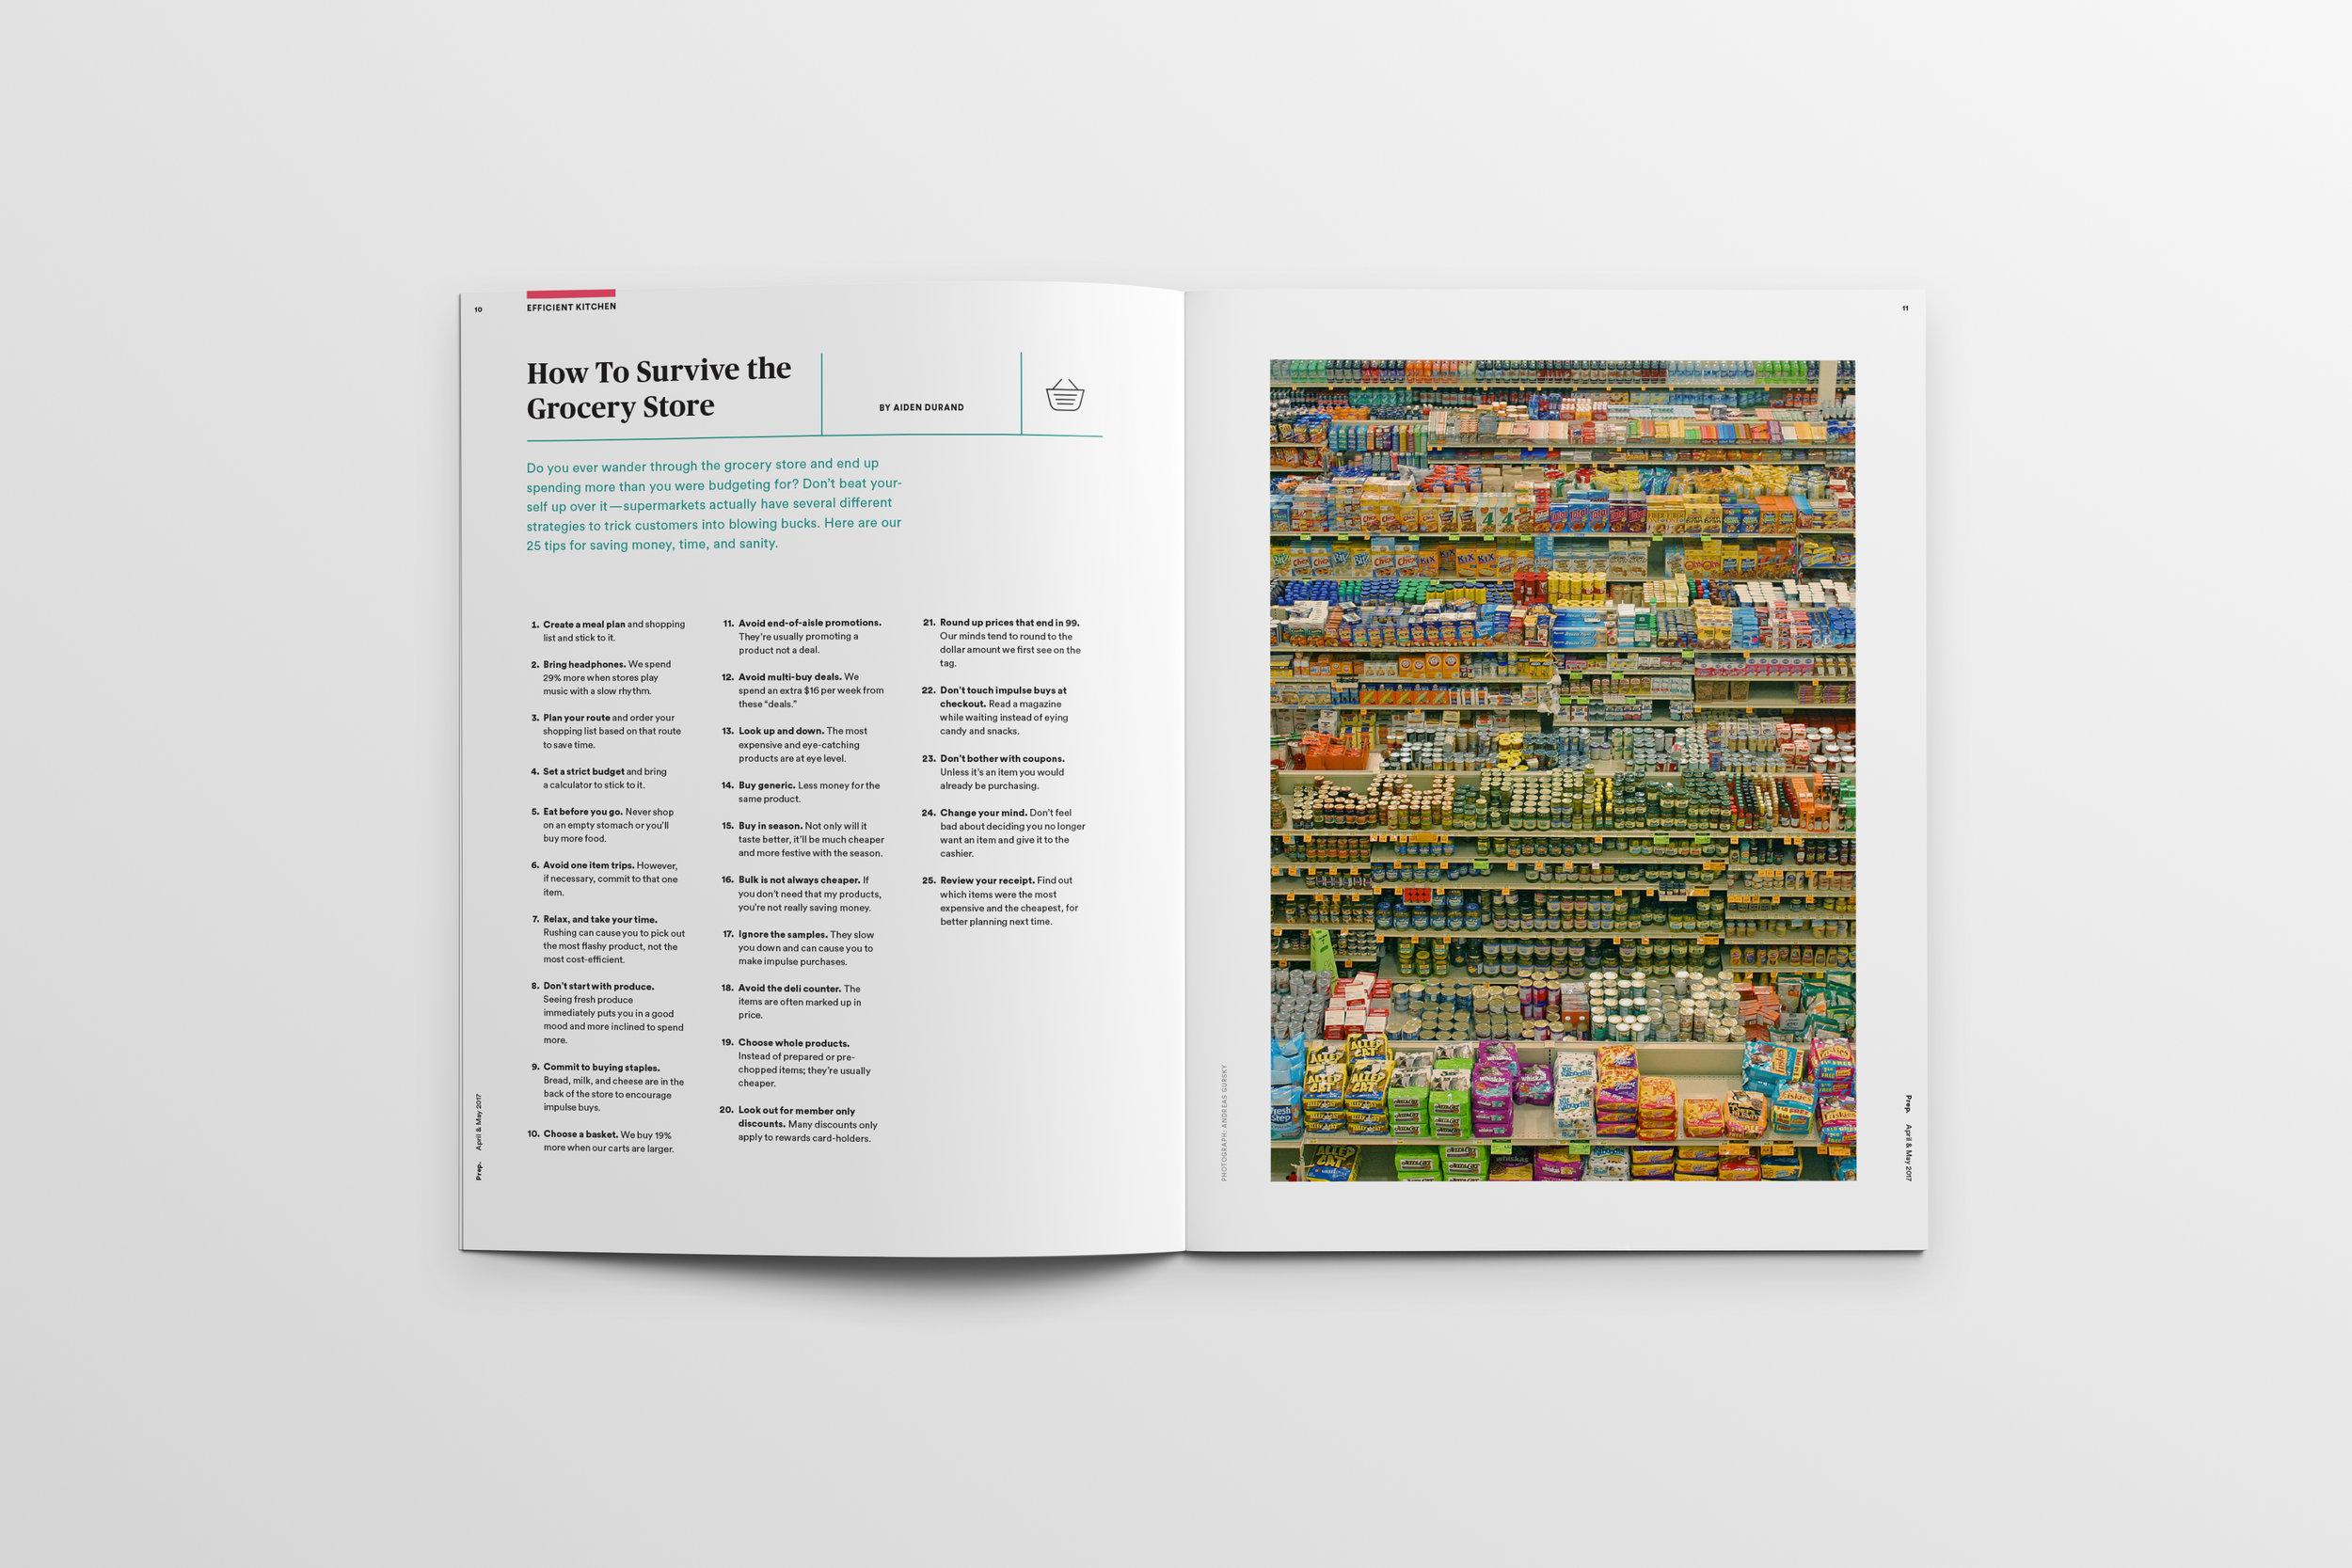 Magazine_Mockup_Pages10-11.jpg